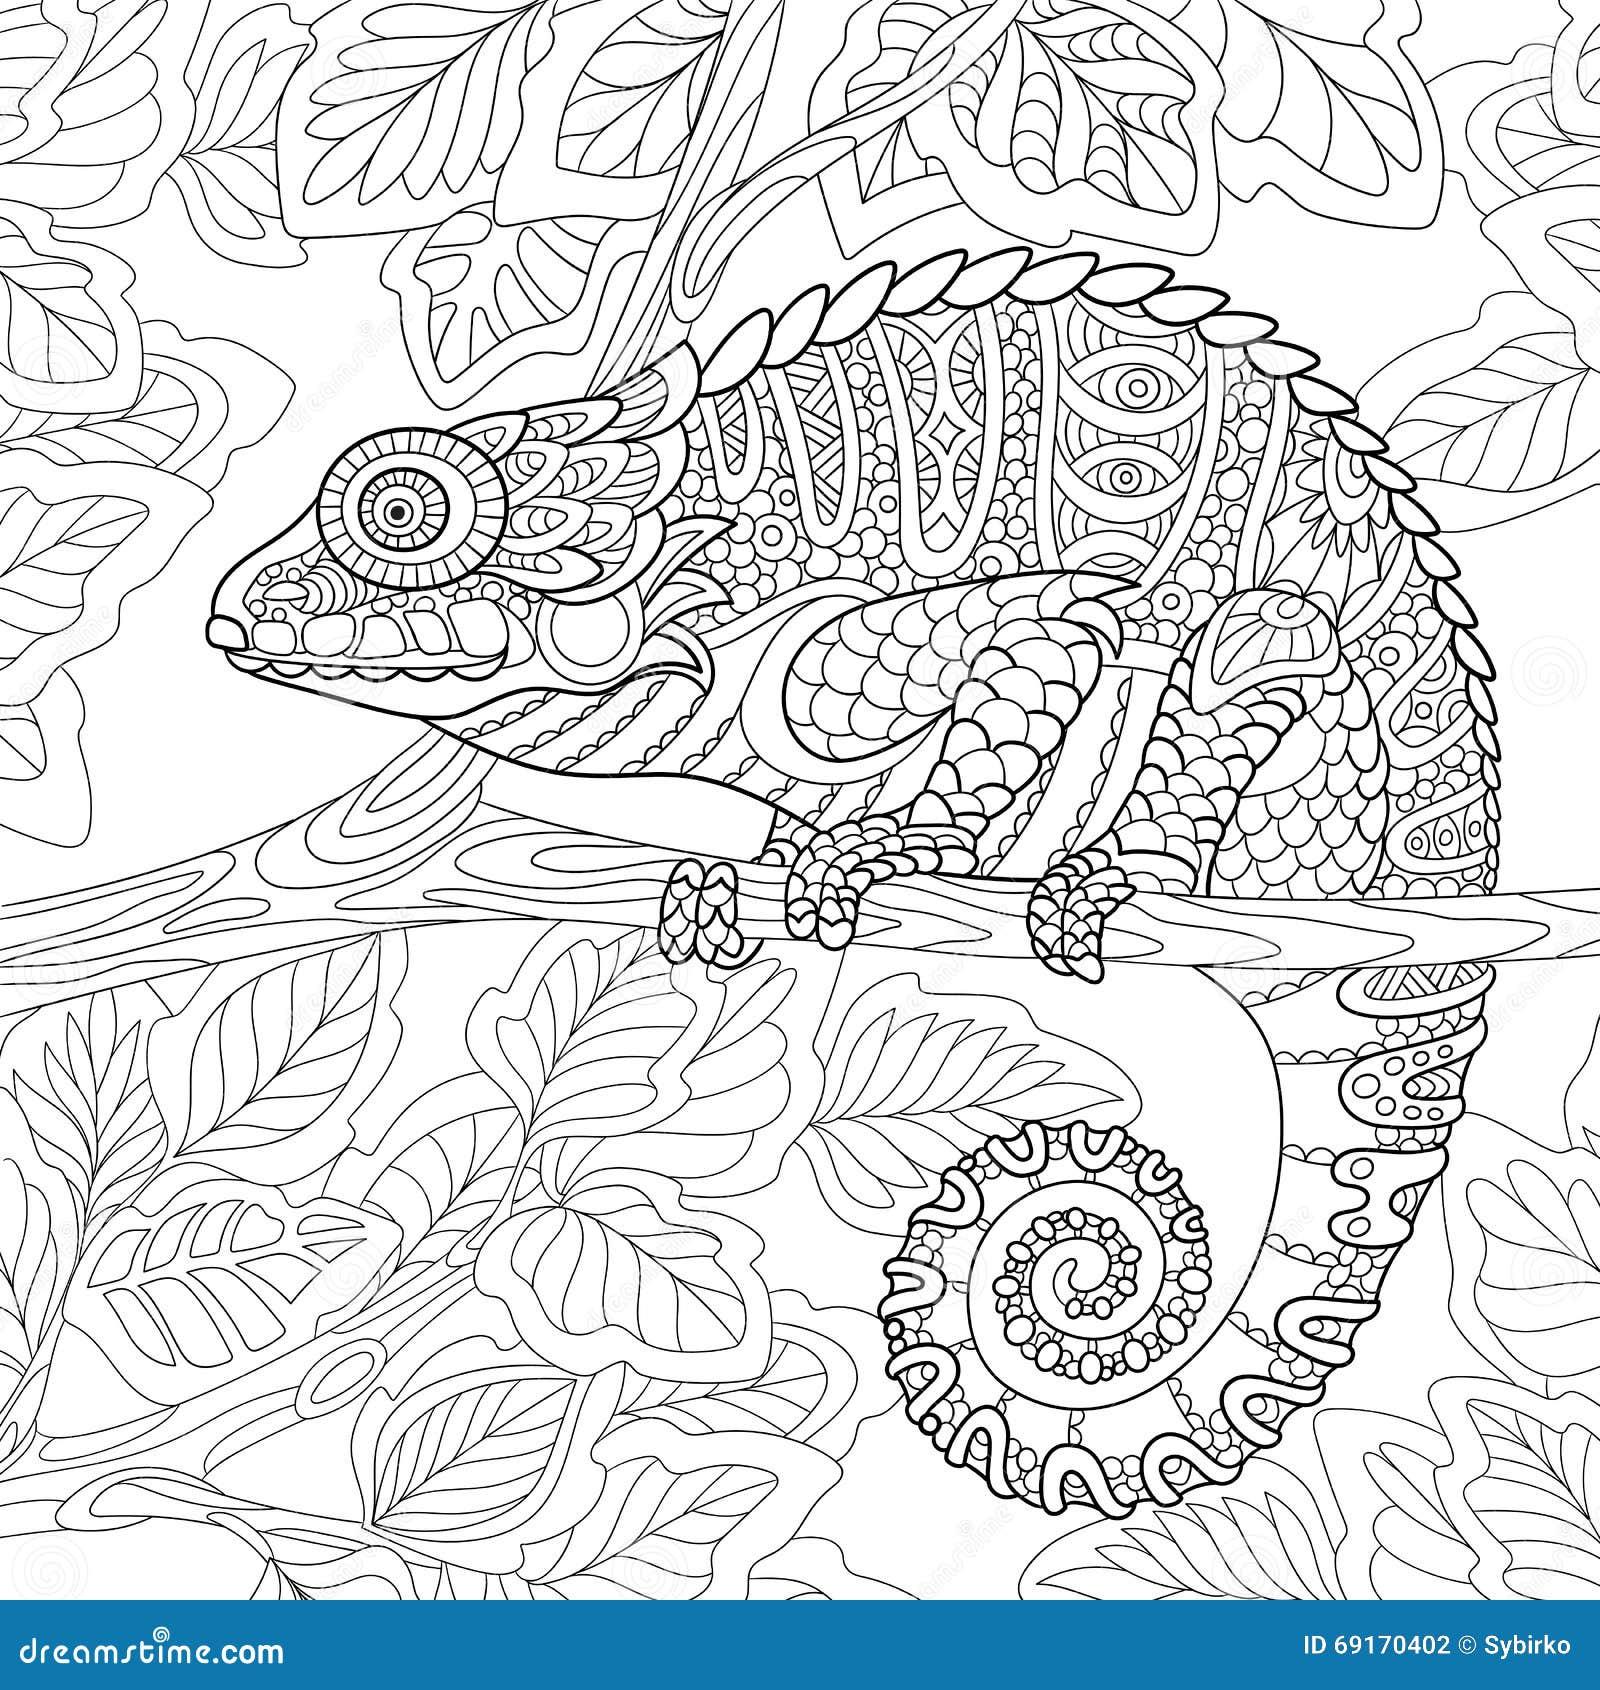 Zentangle Stylized Chameleon Stock Vector